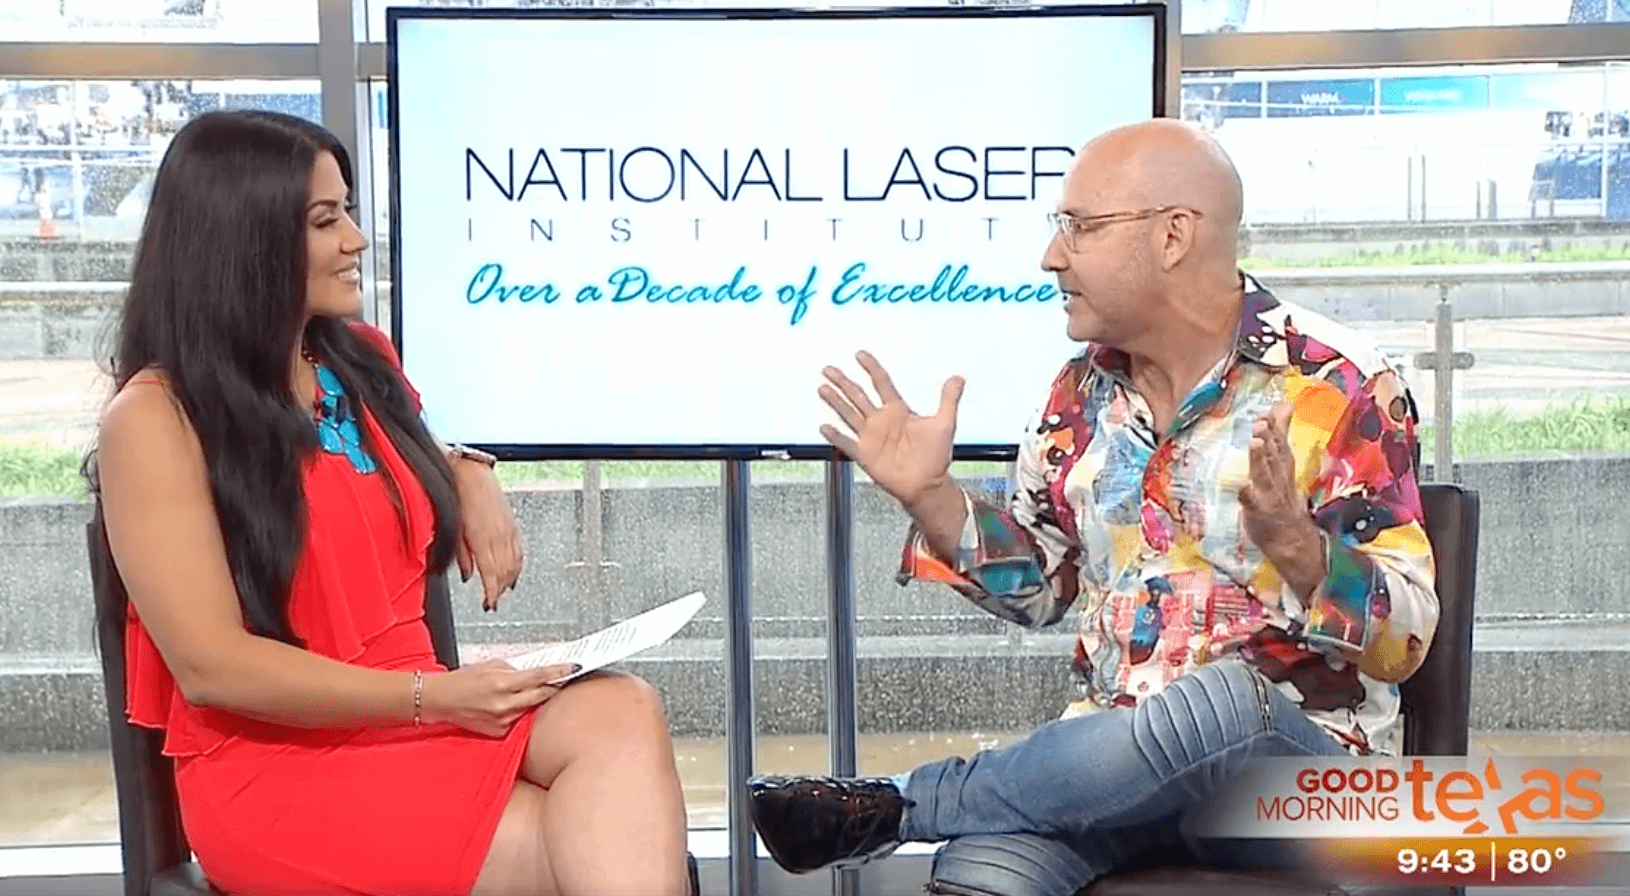 Laser School | Laser Careers News | National Laser Institute